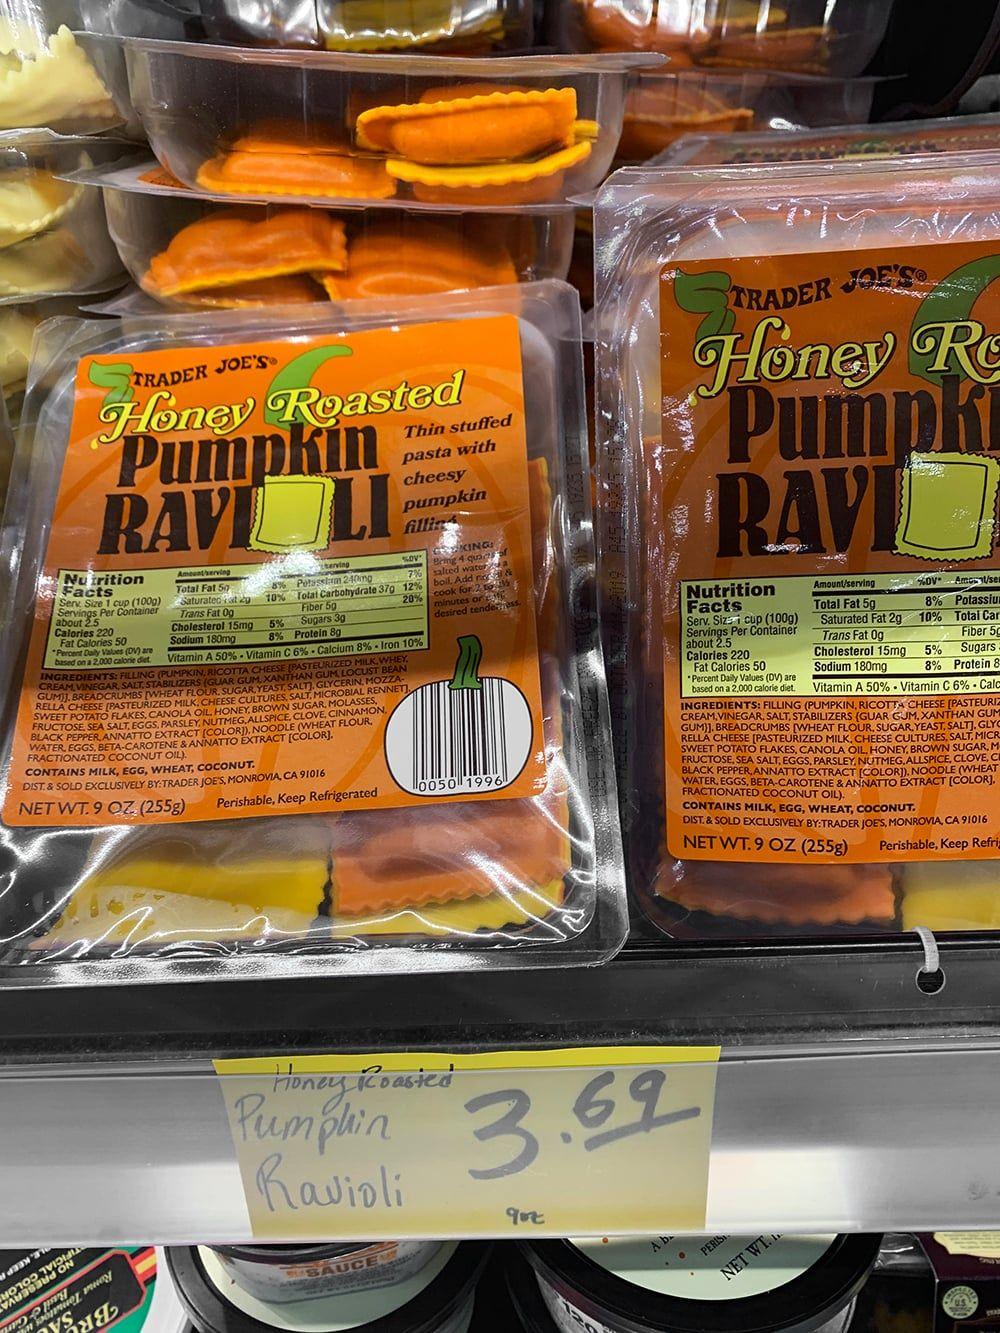 Honey Roasted Pumpkin Ravioli (4) Pumpkin ravioli